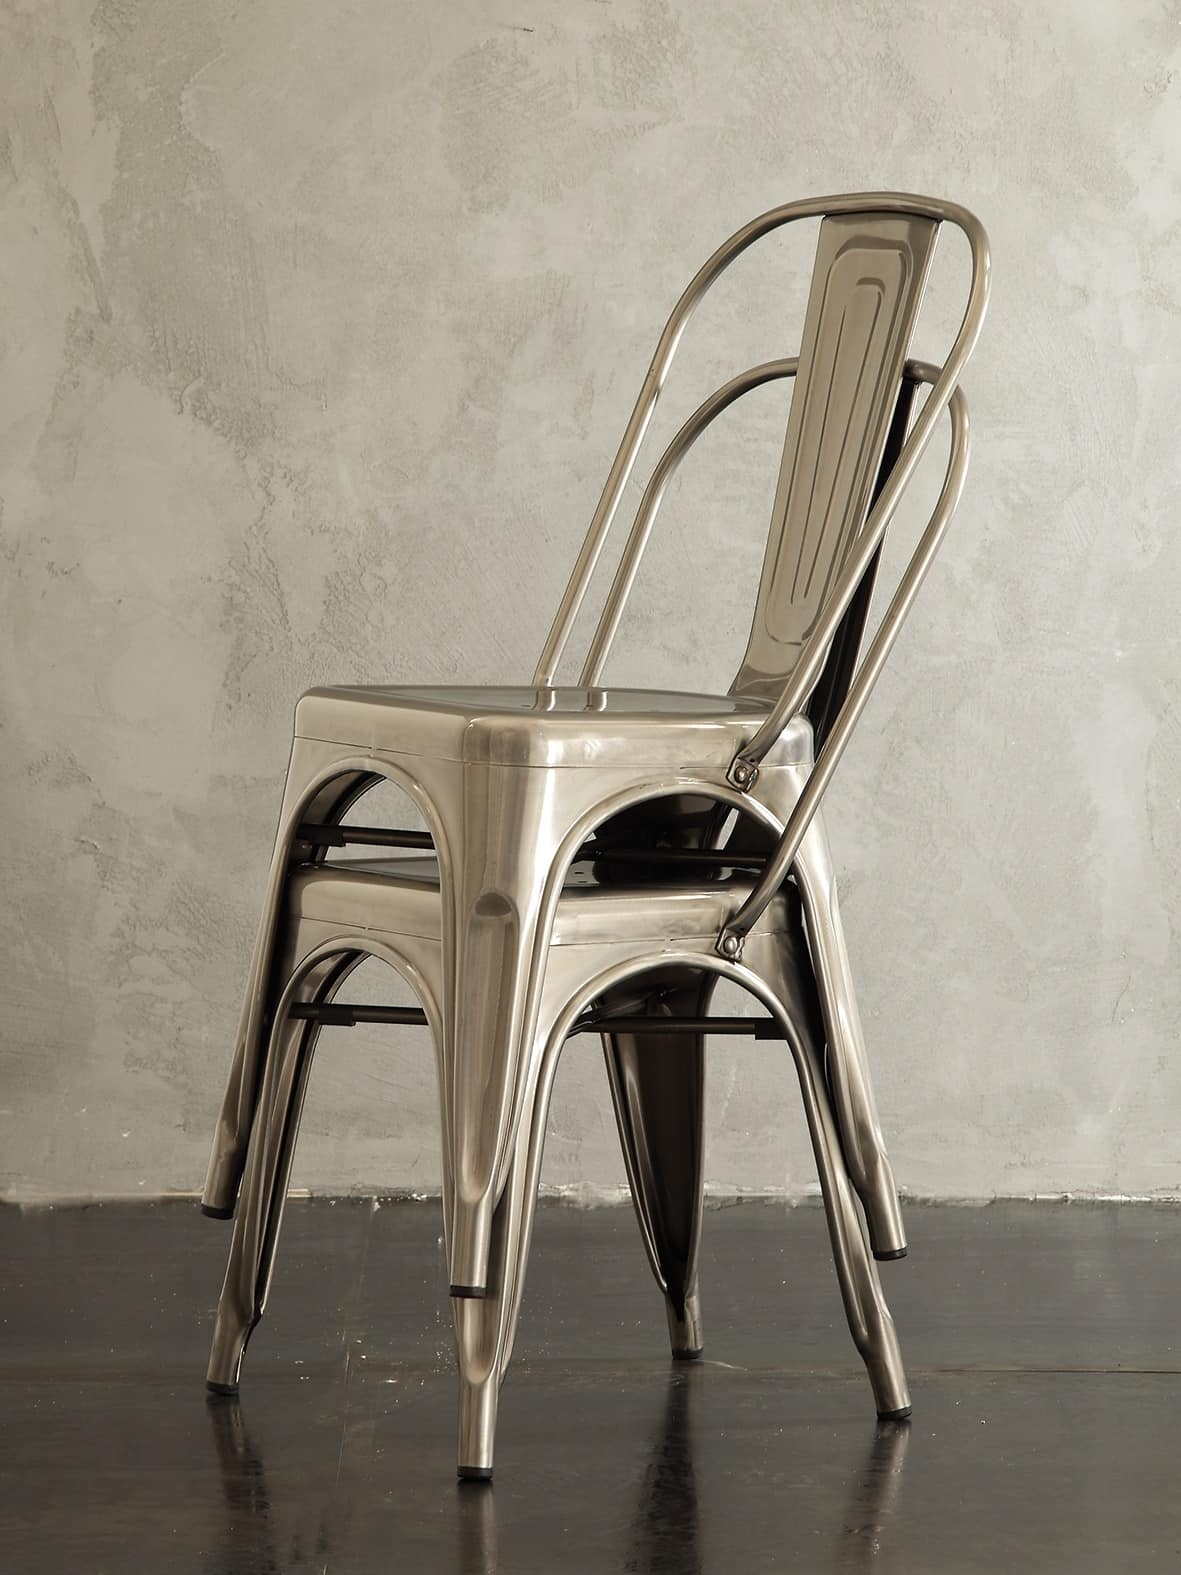 Art. 069 Route 66 sedia, Sedia impilabile in metallo, in stile vintage